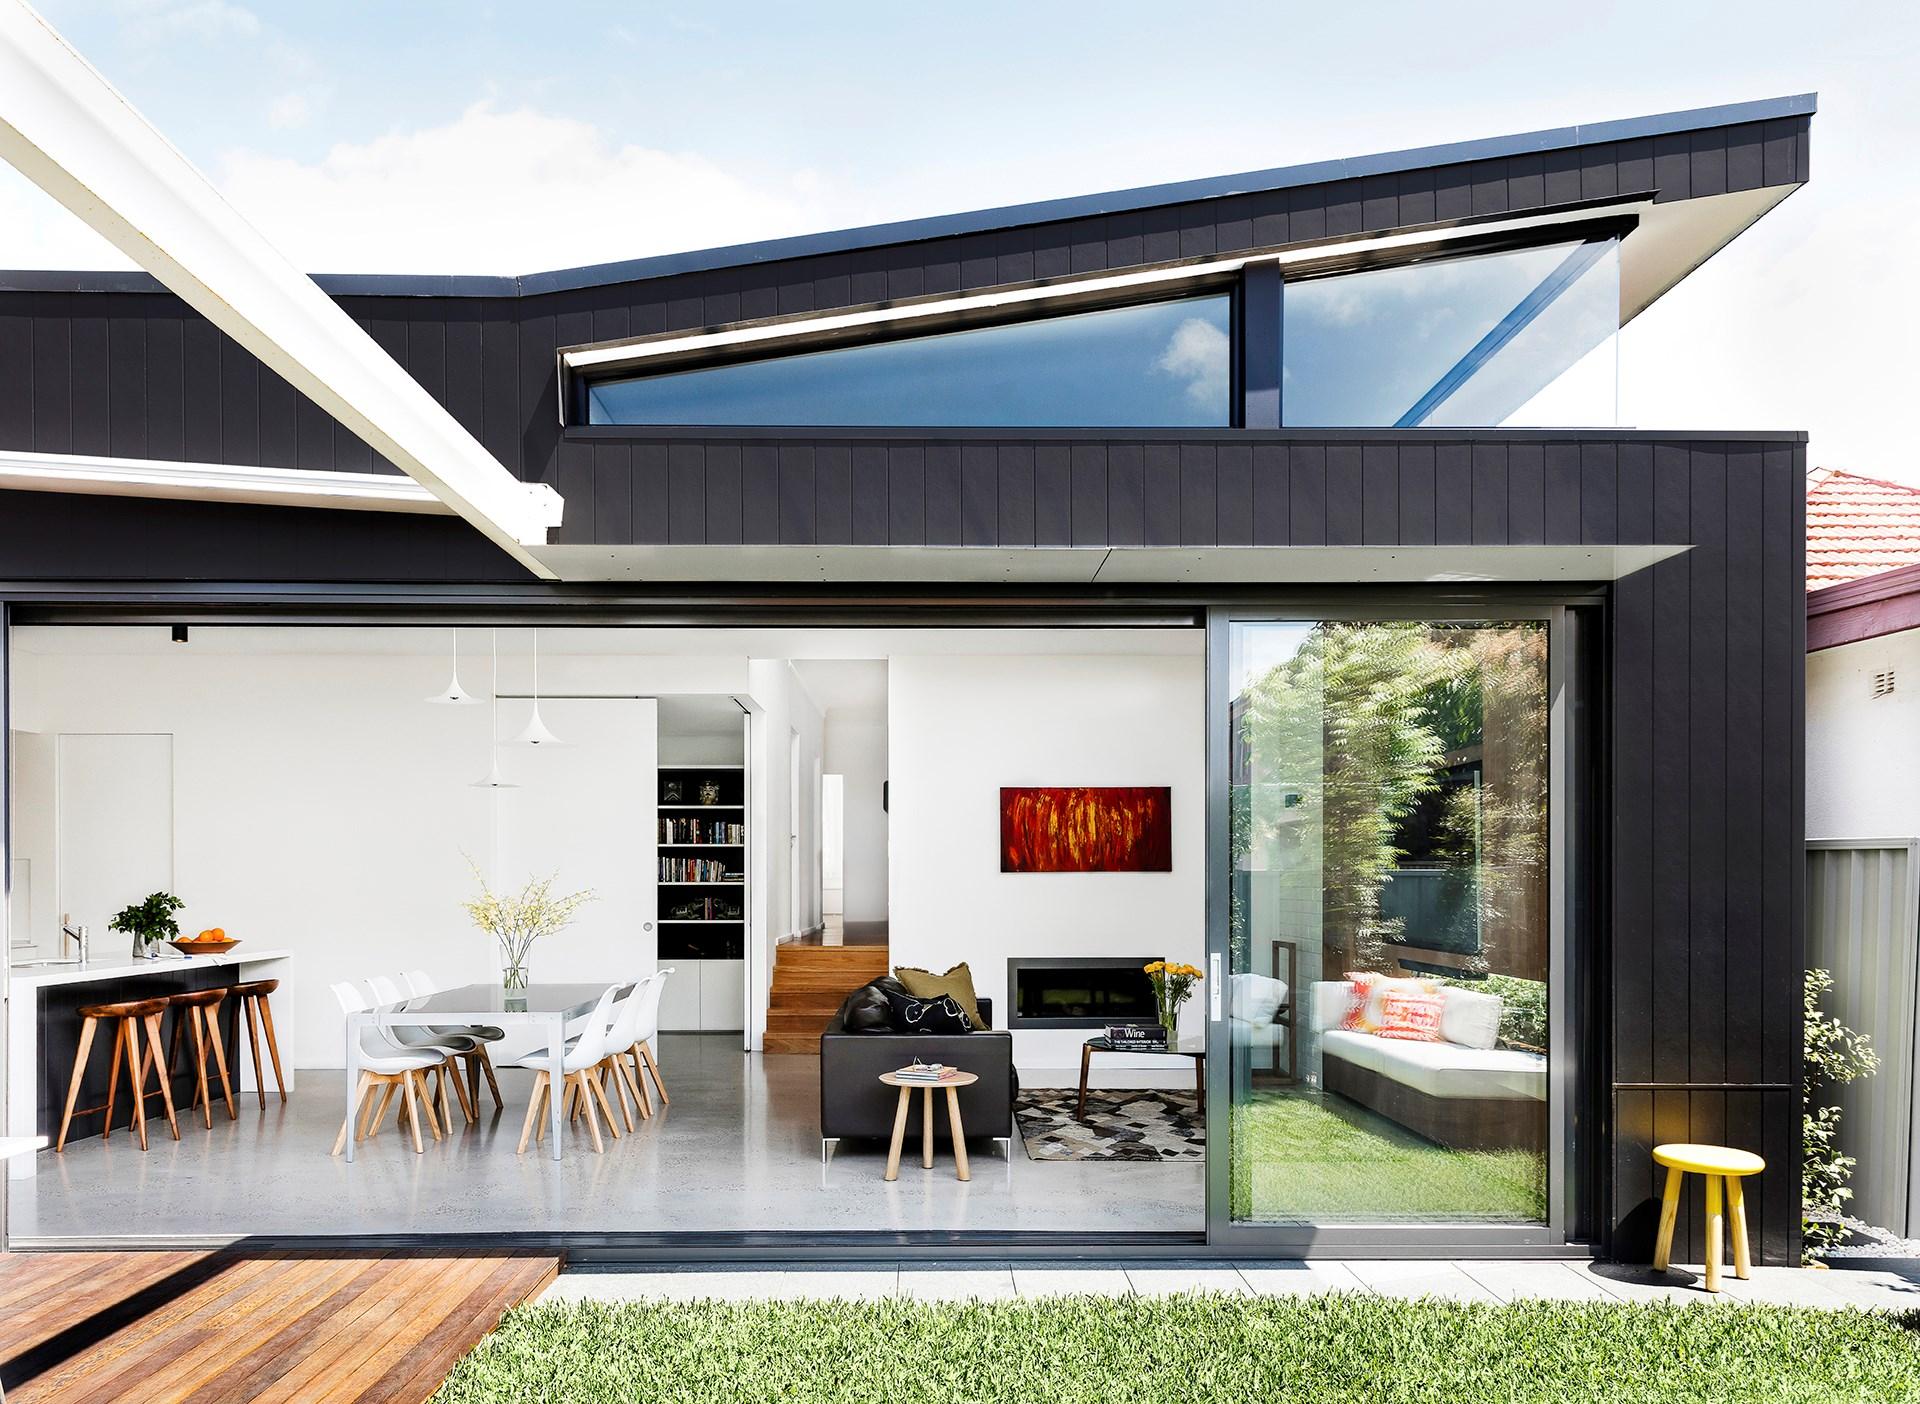 [1940s facade hides a sizzling 21st-century home](http://www.homestolove.com.au/1940s-facade-hides-a-sizzling-21st-century-home-3269). Photo: Maree Homer / *Australian House & Garden*